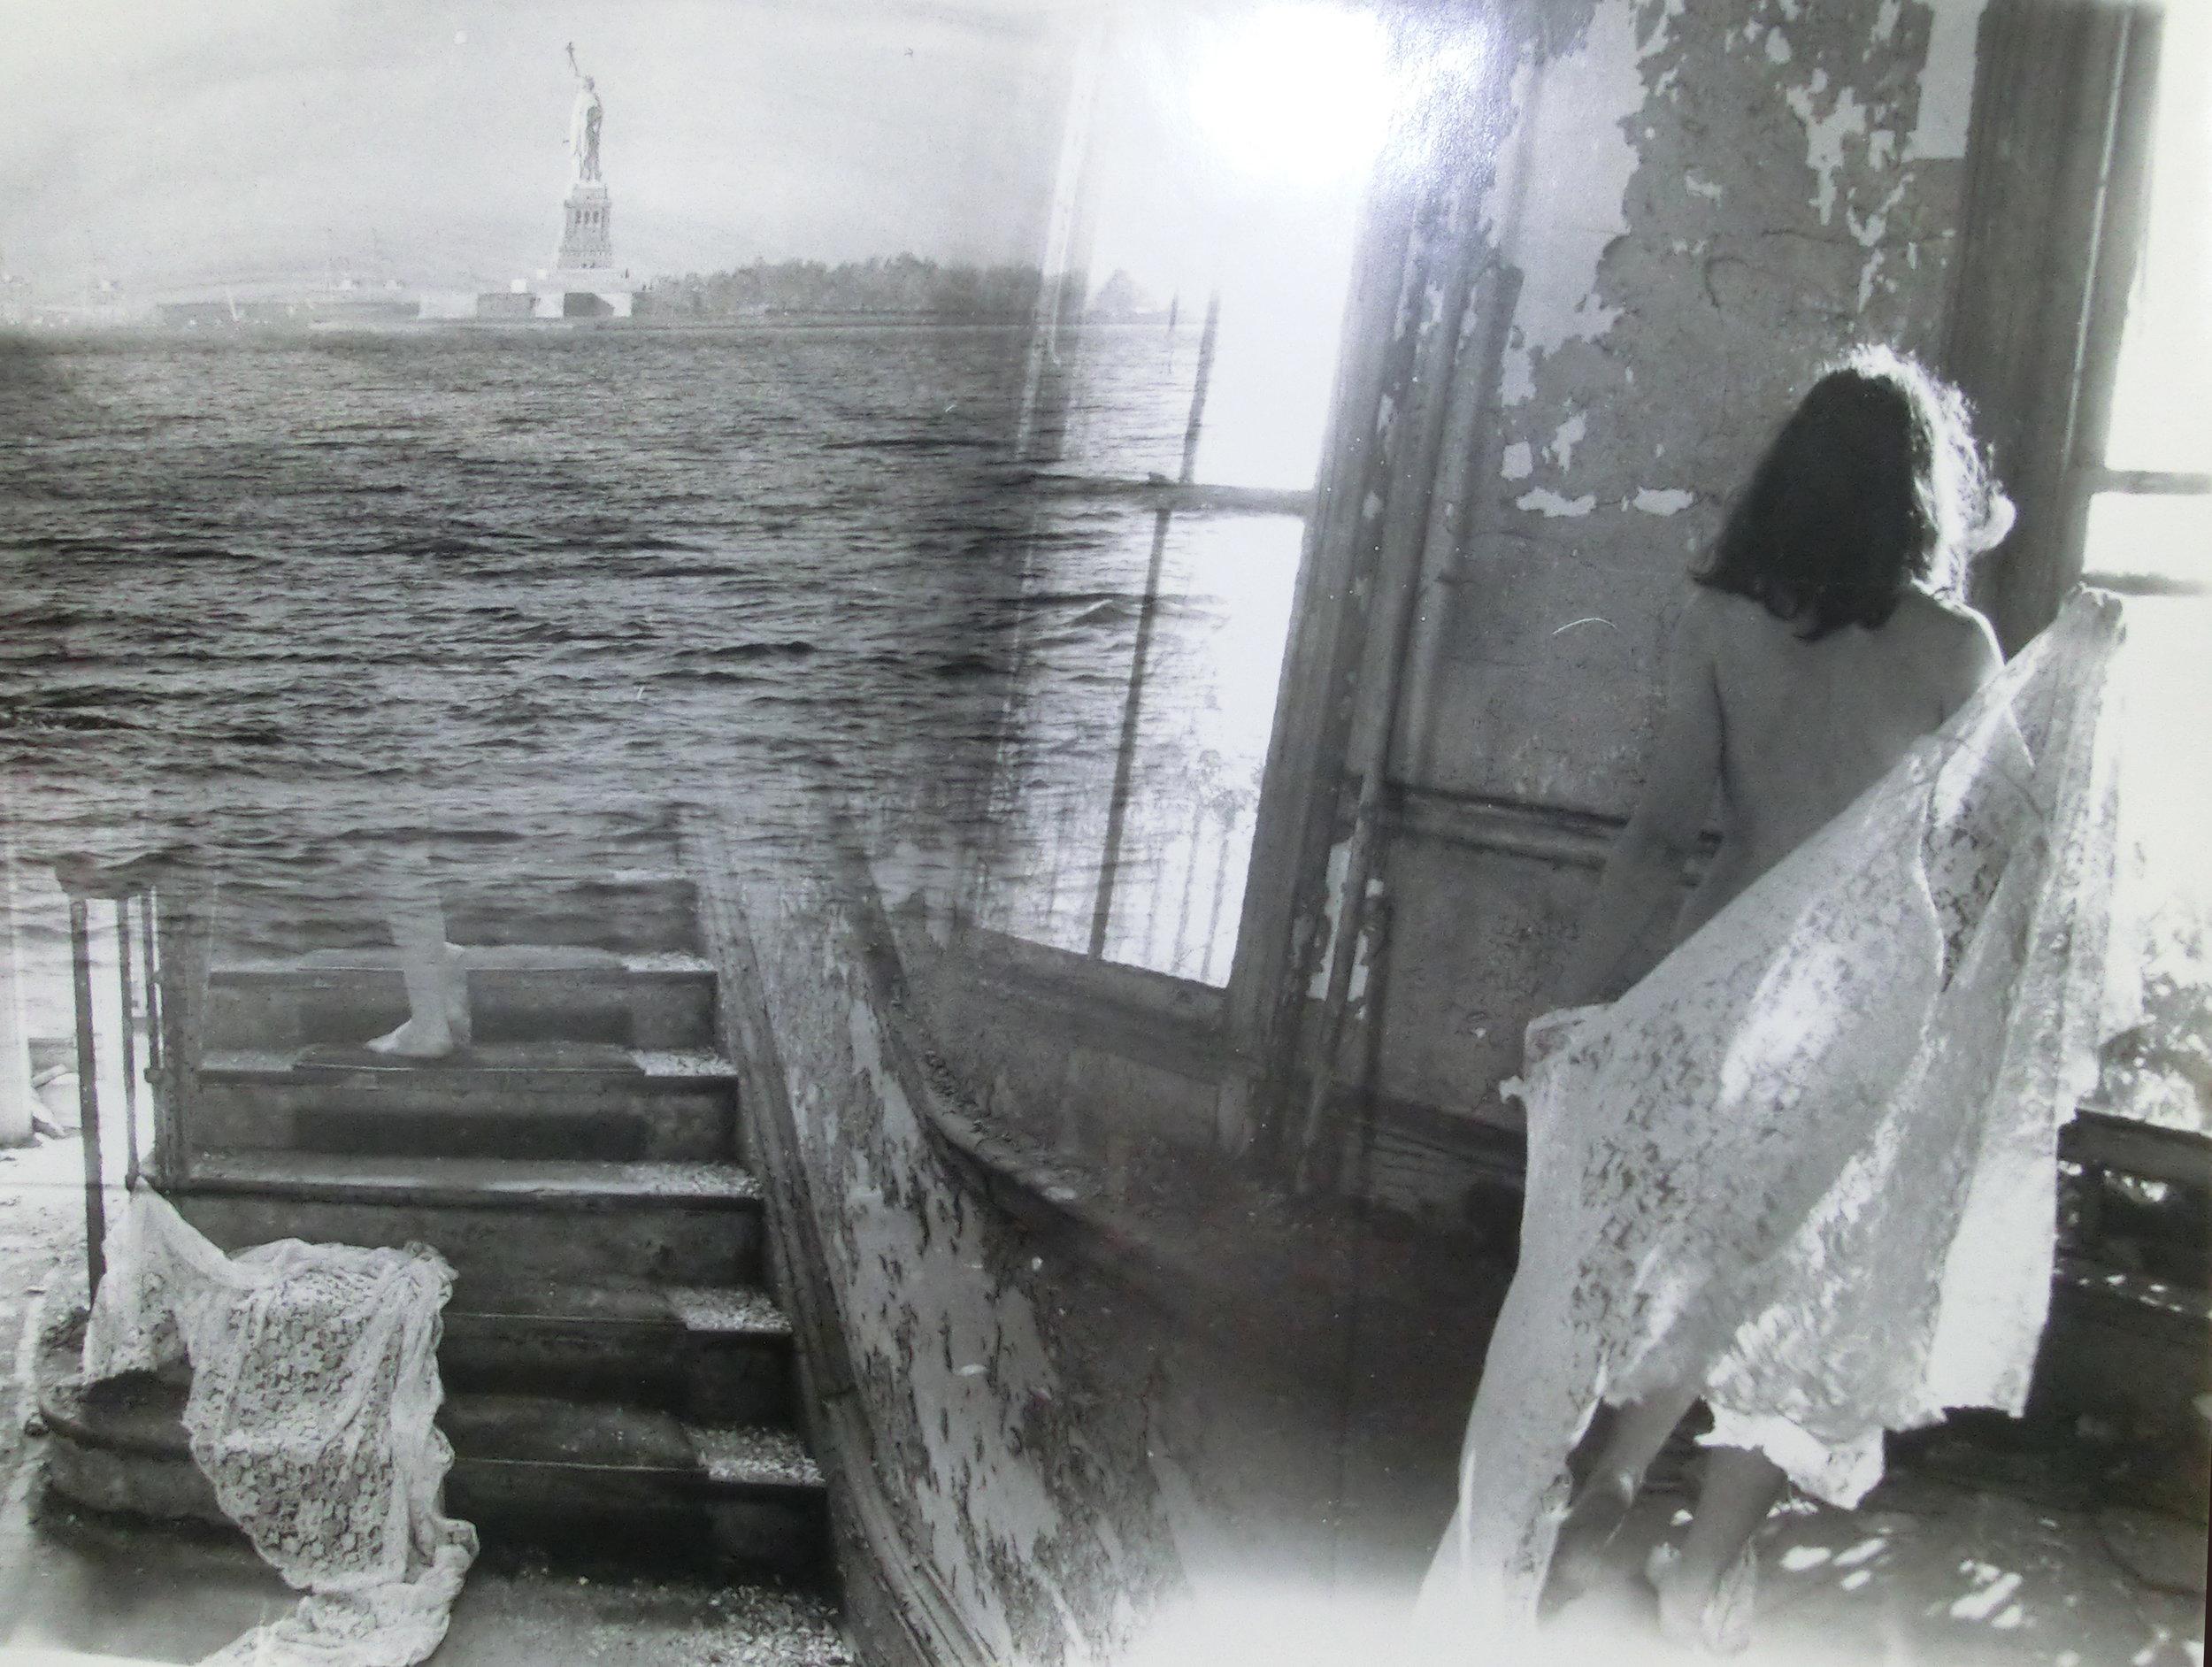 Loren Ellis Liberty off her throne Ellis Island series 2 of 3 11 by 14 300 DPI.jpg